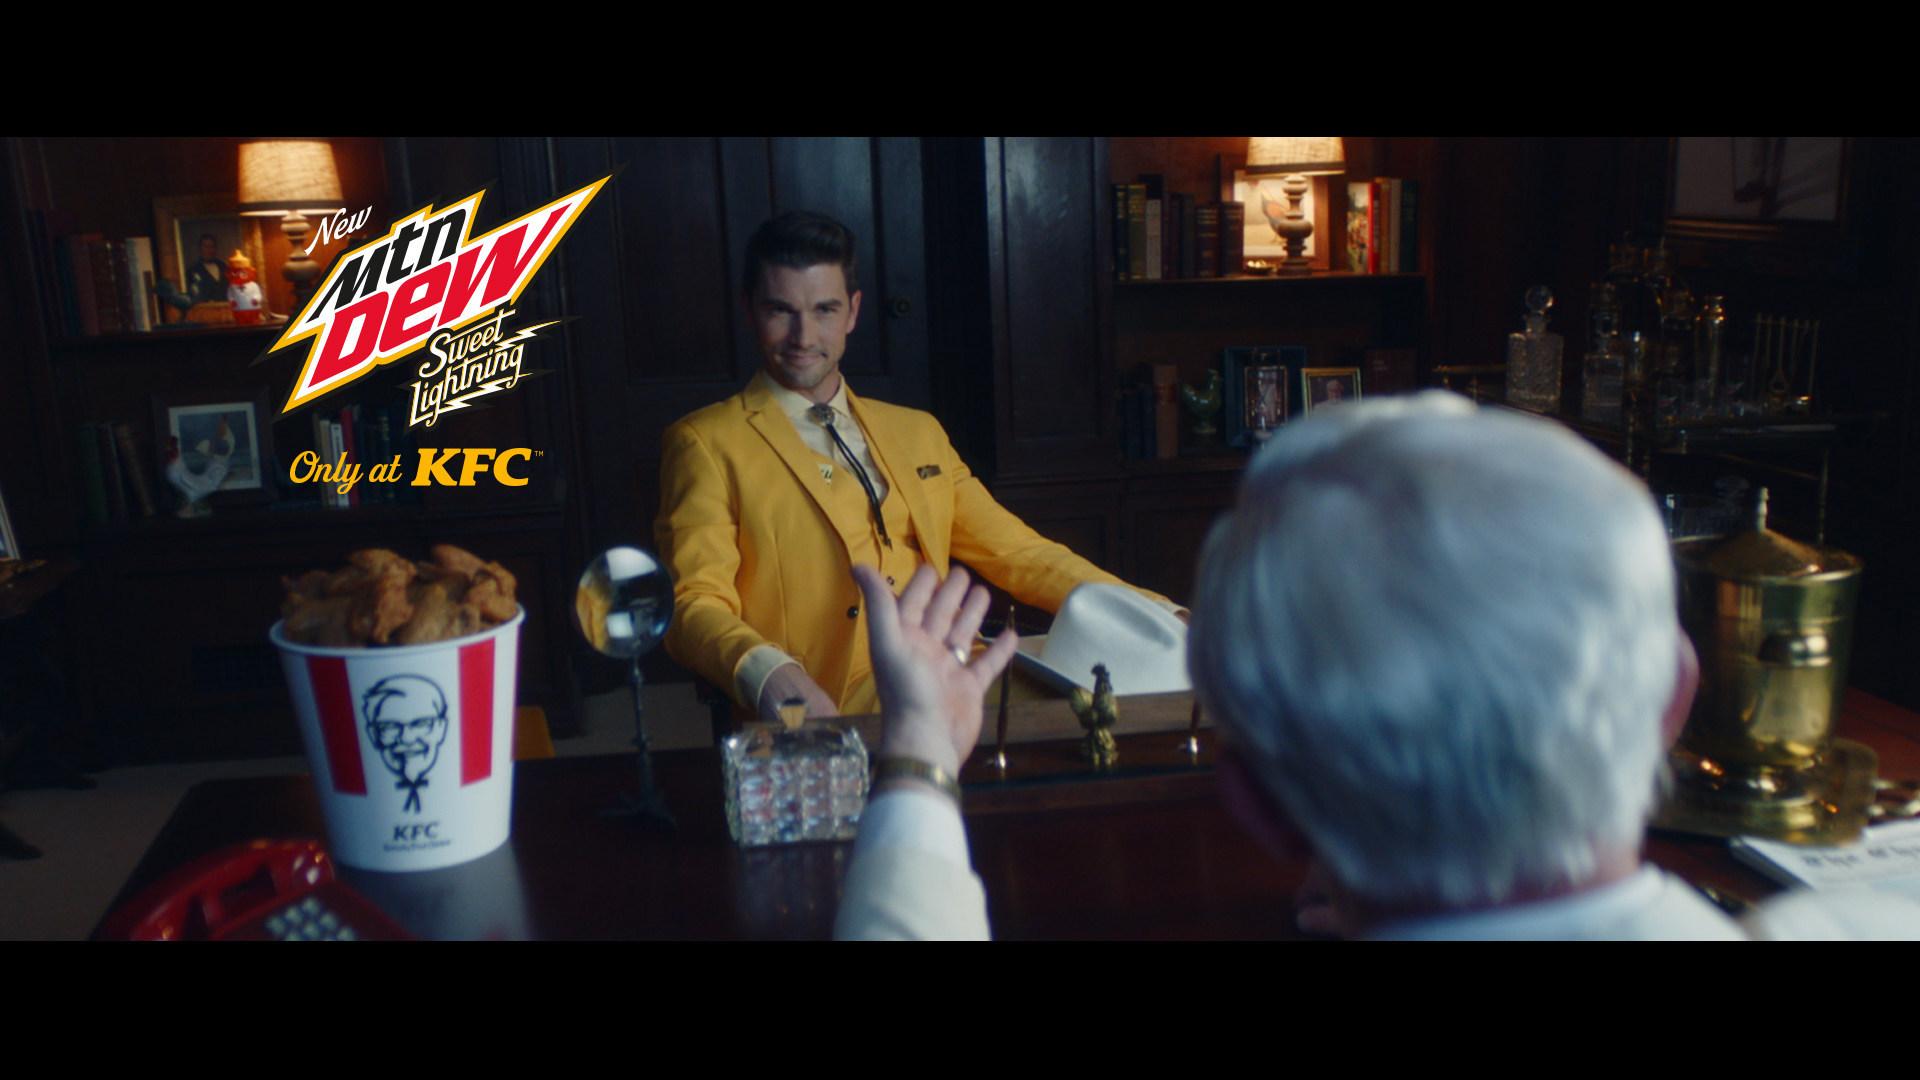 MTN DEW Colonel-Sweet-Lightning-Hero-Image